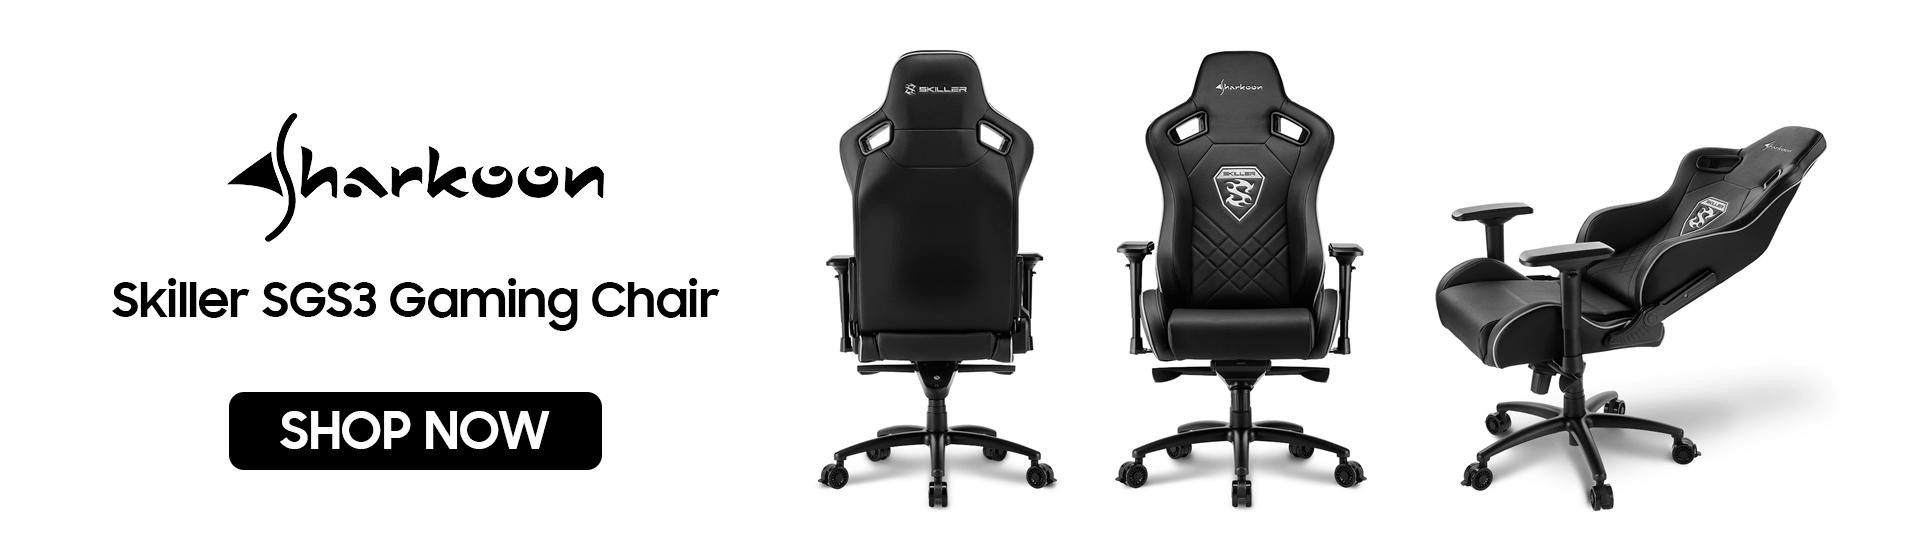 Sharkoon Gaming Chair